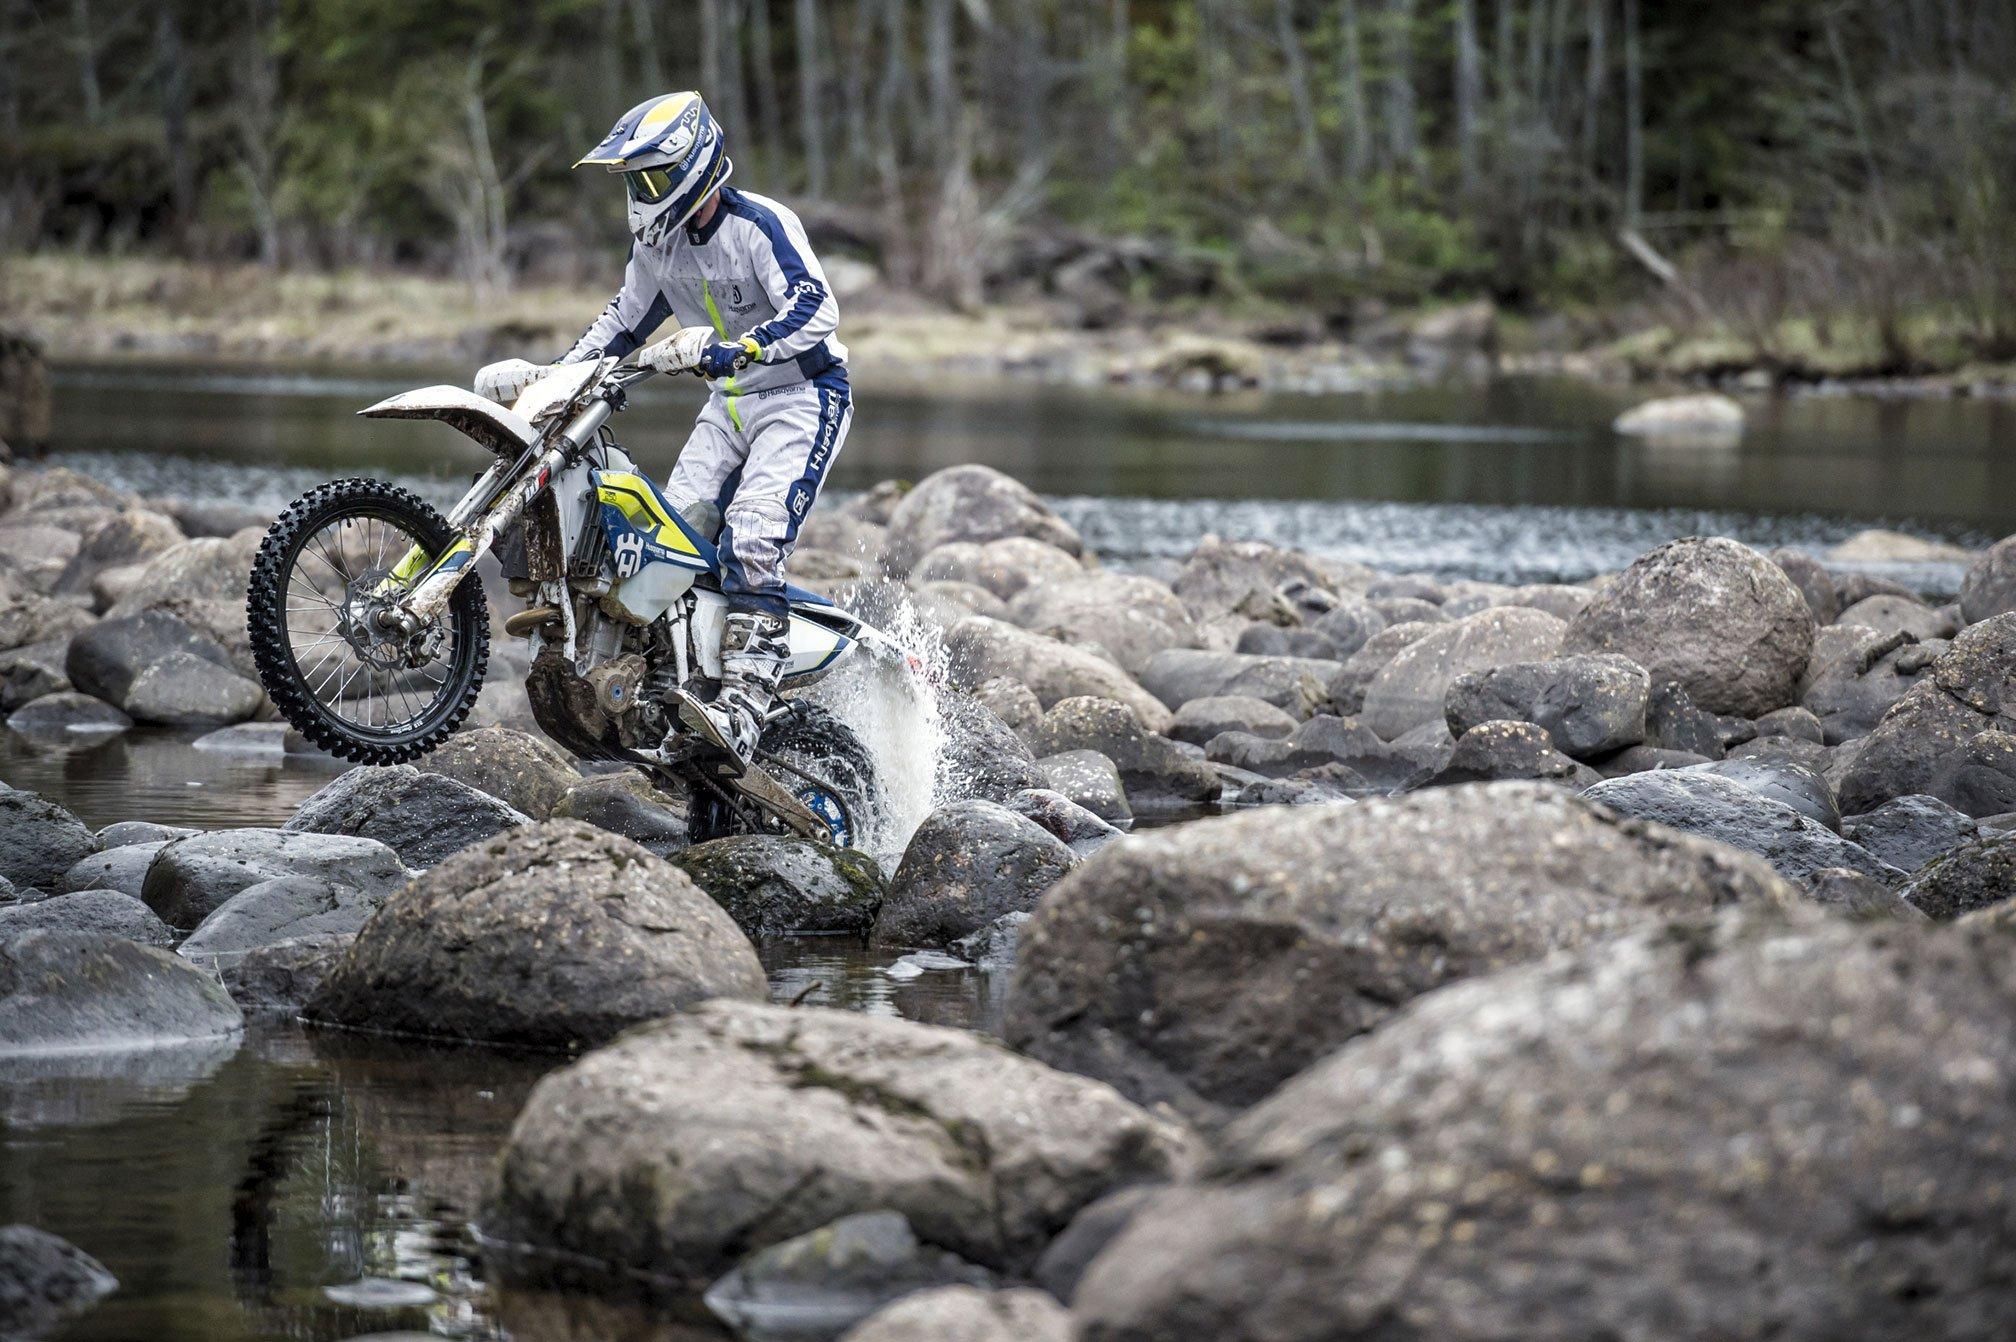 2016 Husqvarna FE250 Enduro Moto Motocross Dirtbike Bike